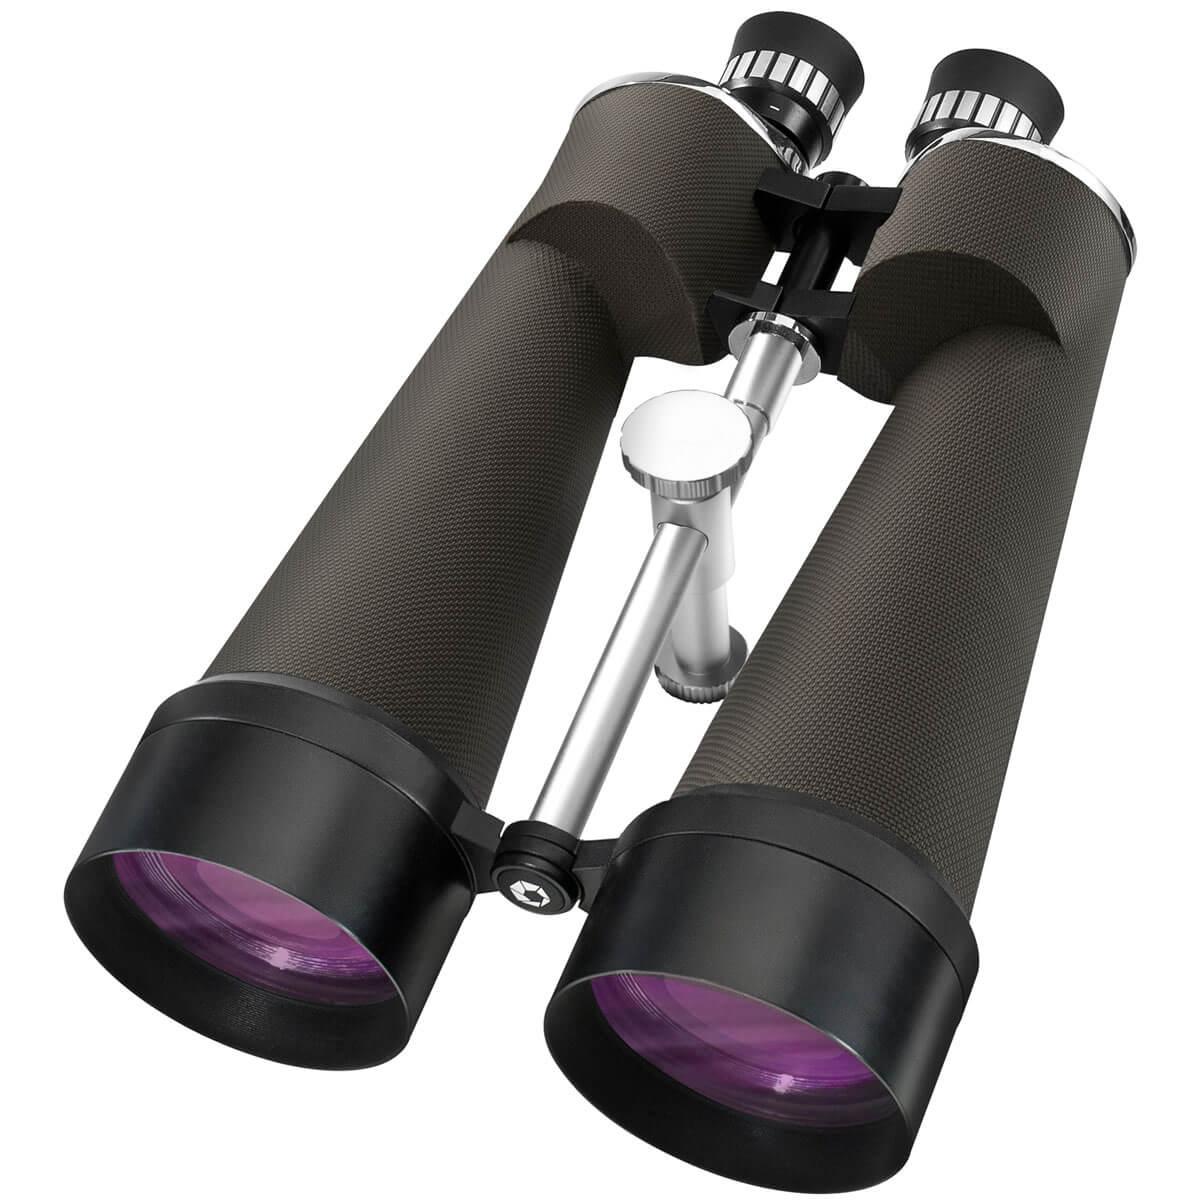 25x100mm WP Cosmos Astronomical Binoculars by Barska